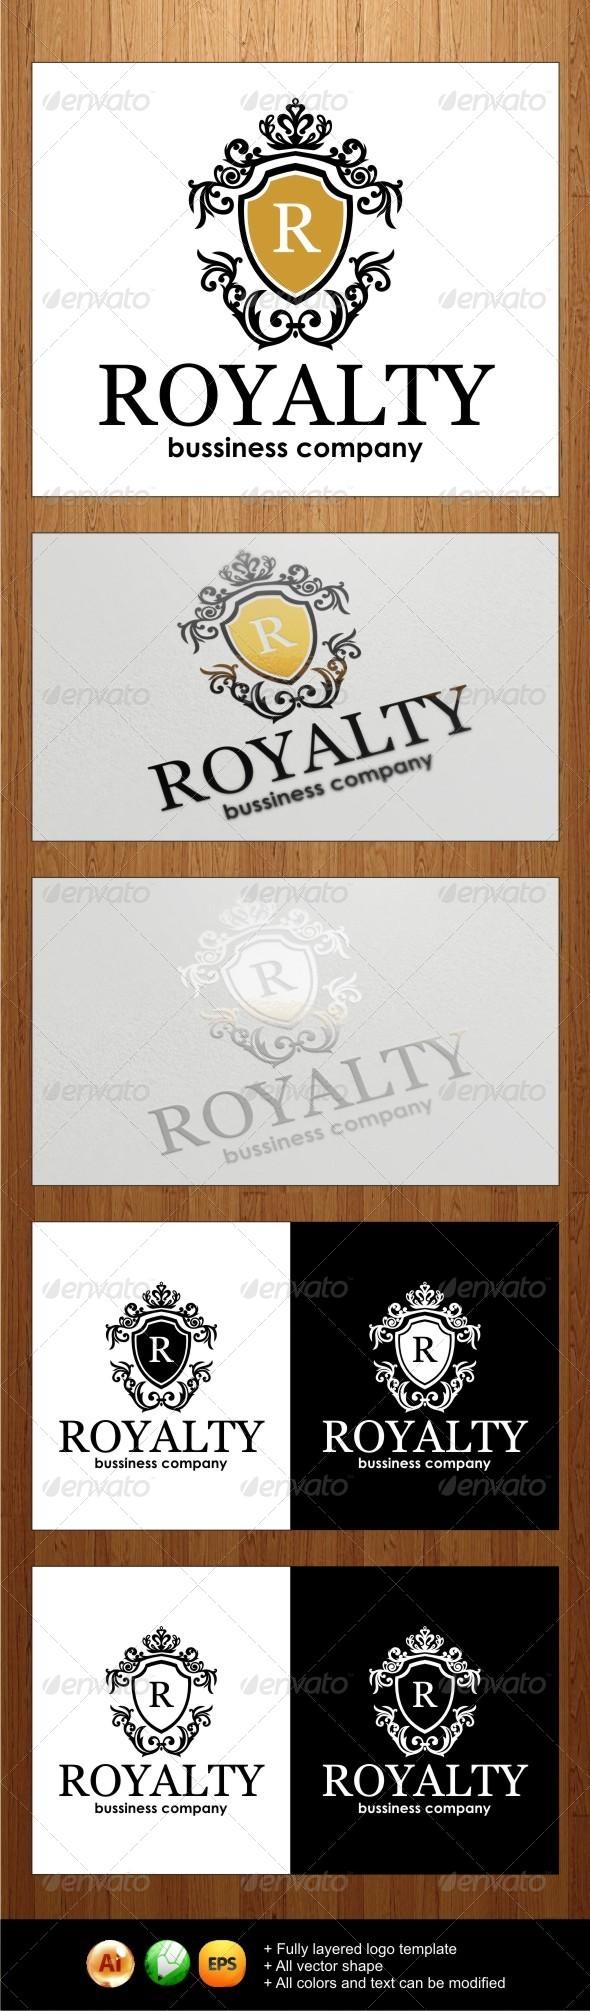 GraphicRiver Royalty Logo 3981191